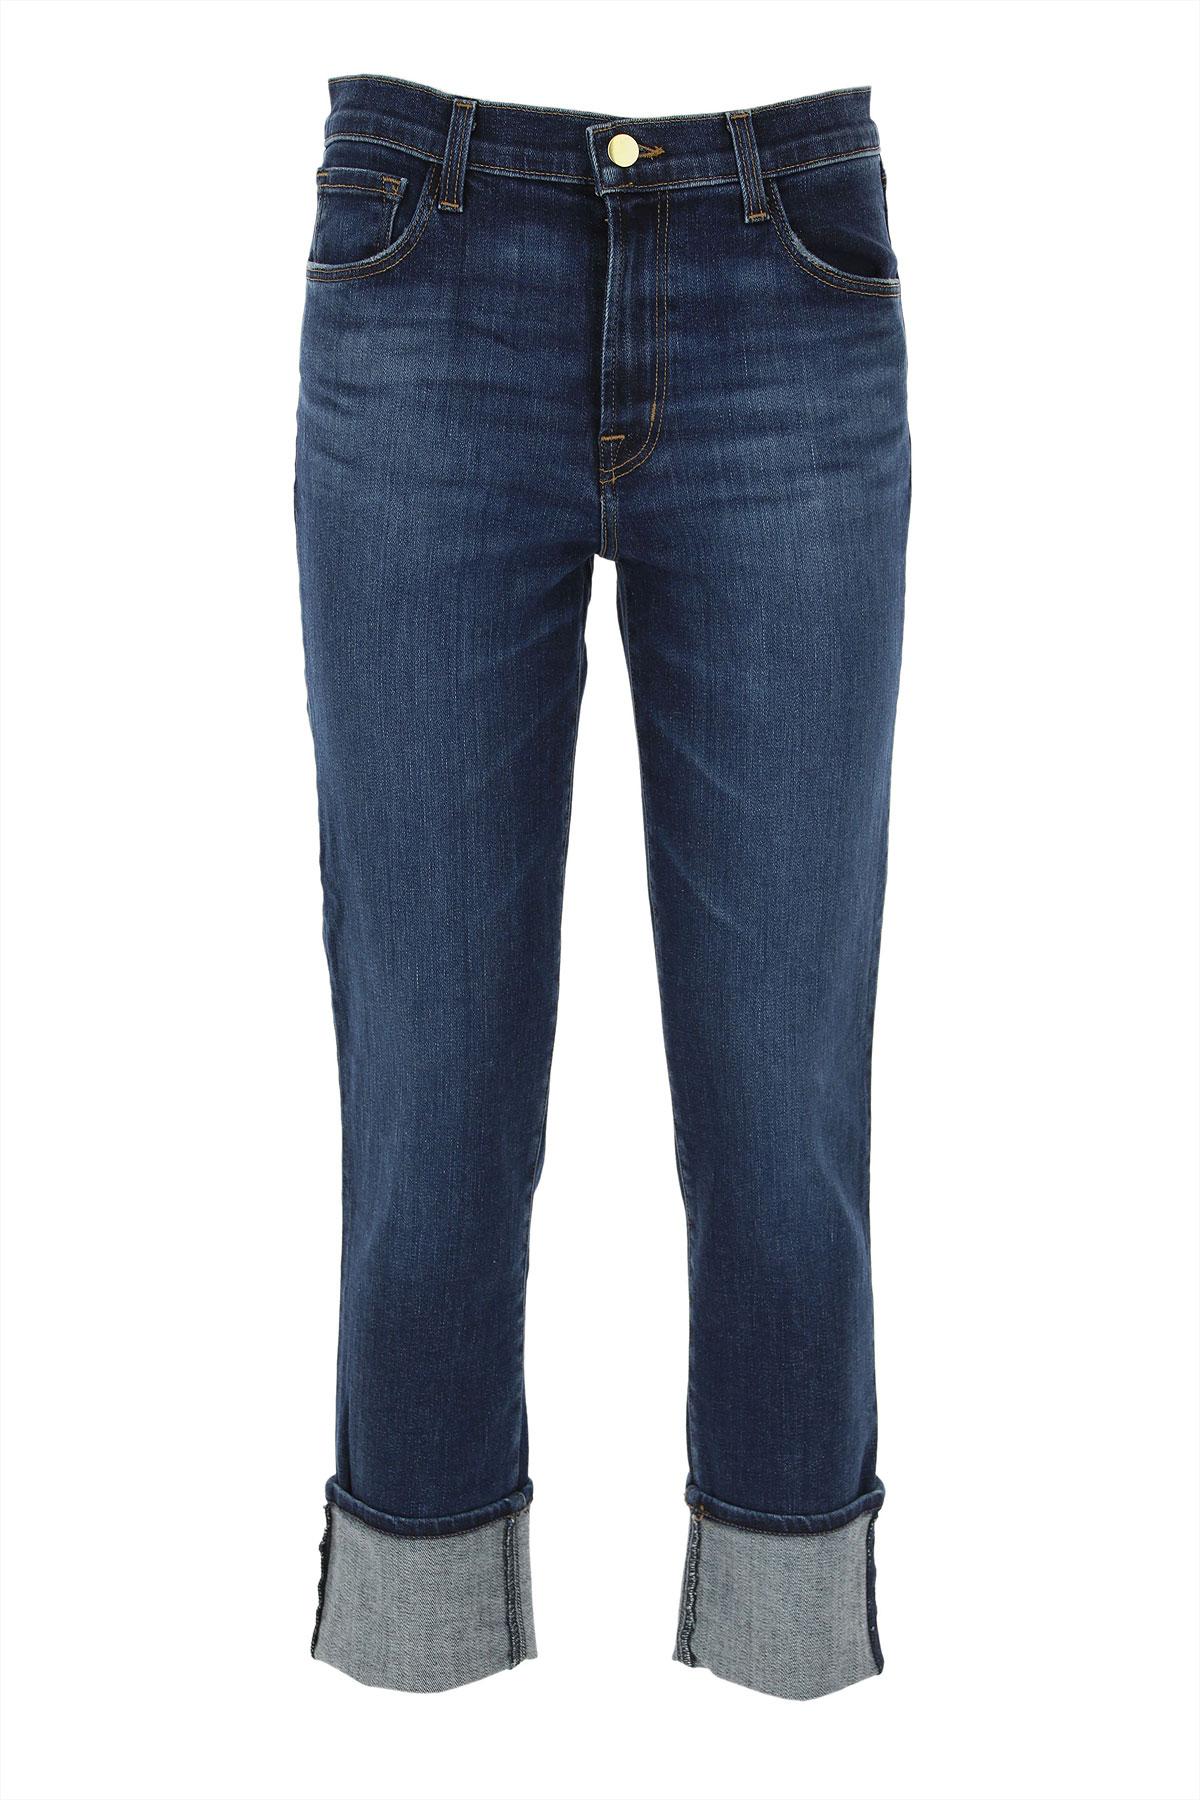 J Brand Jeans On Sale, Denim, Cotton, 2019, 26 27 28 29 30